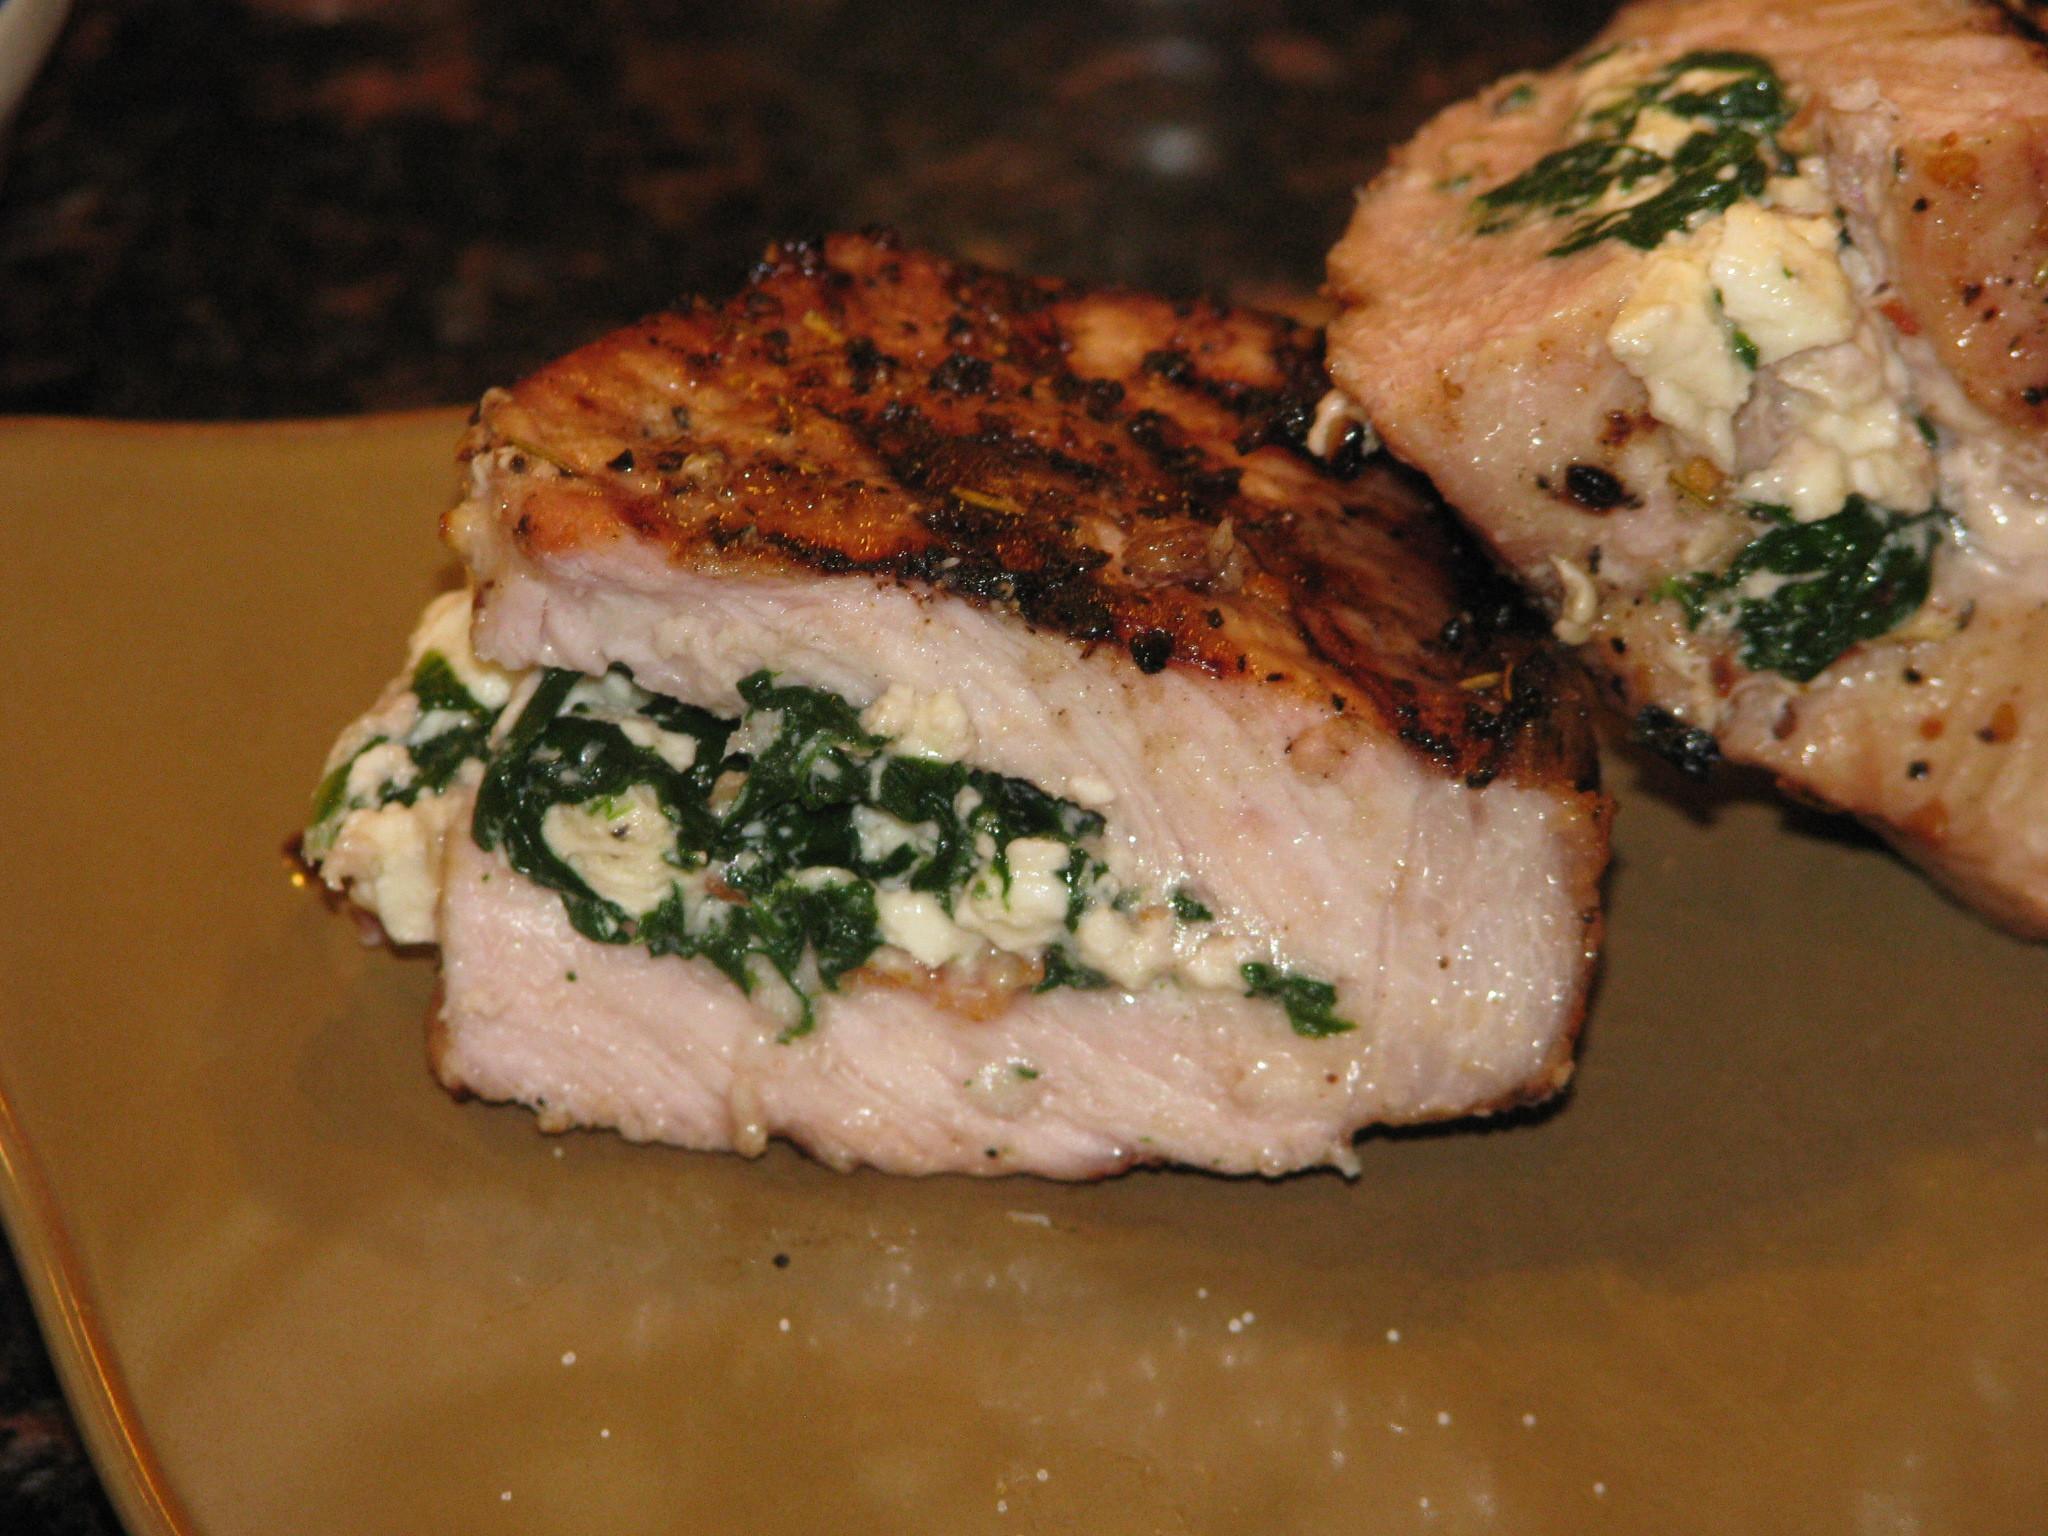 Spinach Stuffed Pork Chops  Feta and Spinach Stuffed Pork Chops